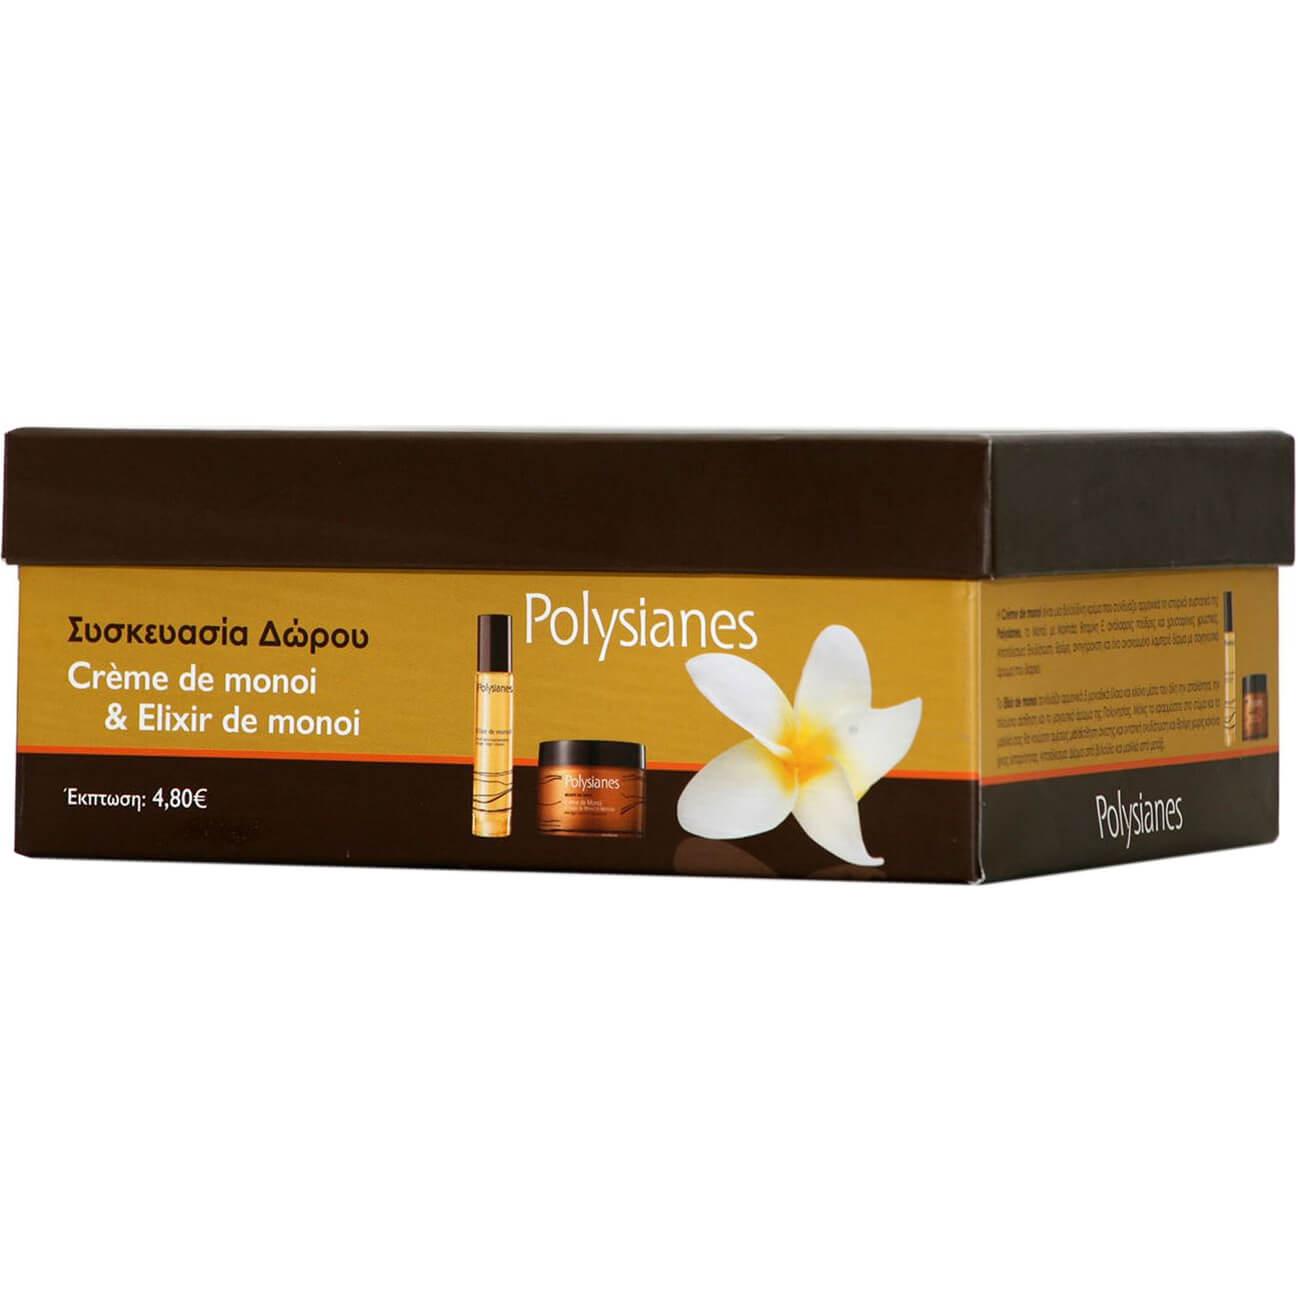 Polysianes Πακέτο Προσφοράς Body Beauty Monoi Cream 200ml & Elixir de Monoi 100ml σε Συσκευασία Δώρου